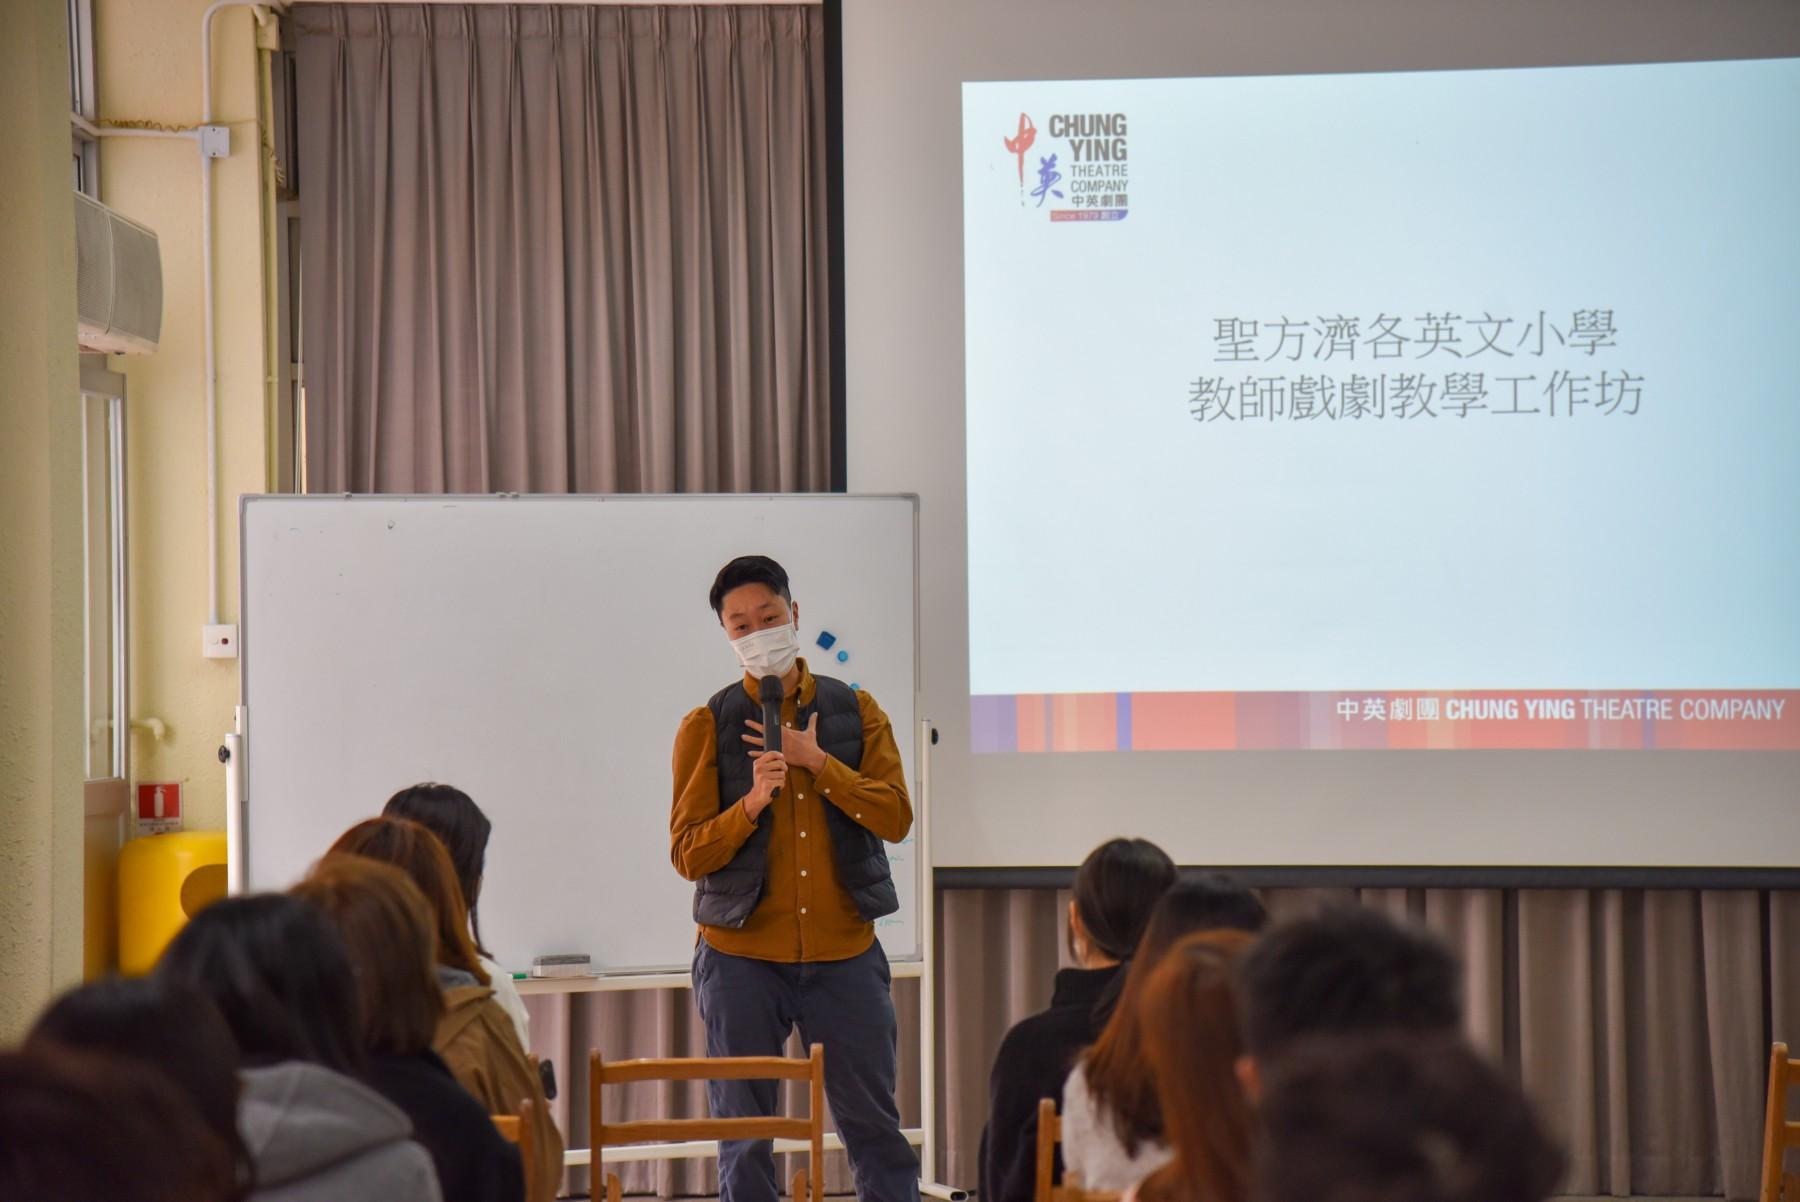 https://sfaeps.edu.hk/sites/default/files/large_dsc_5384.jpg